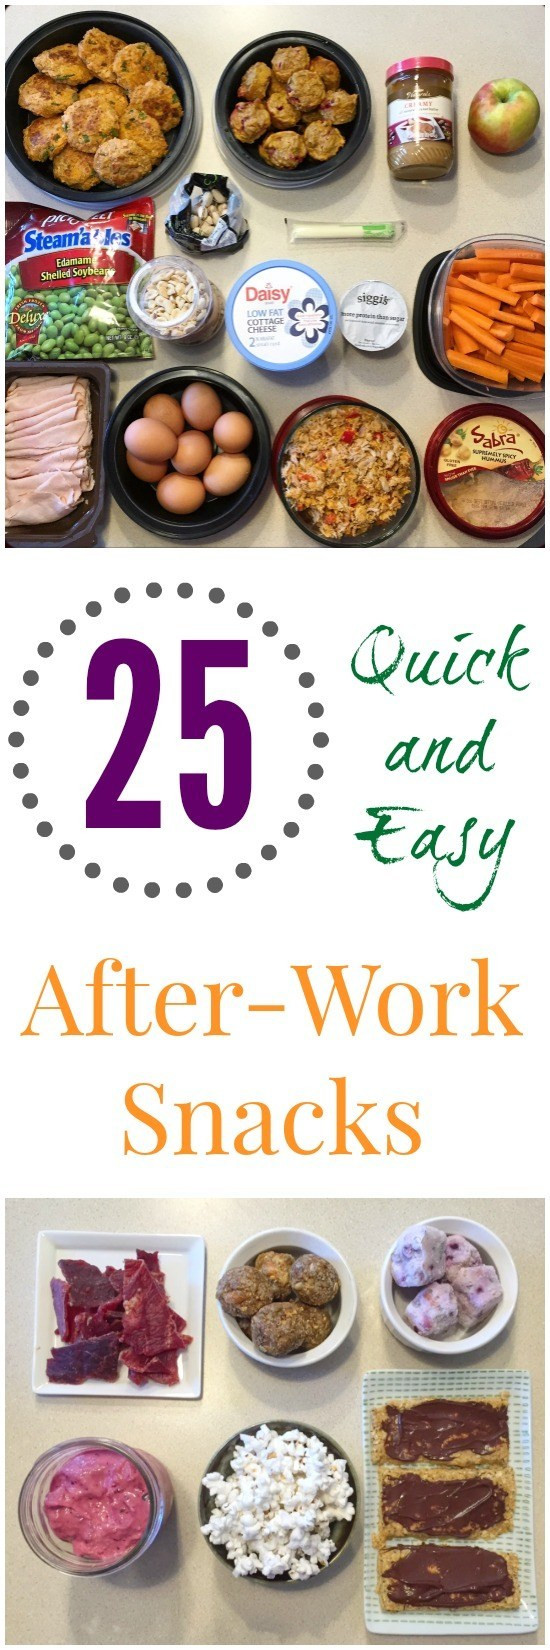 Easy Healthy Snacks For Work  Healthy Snack Ideas